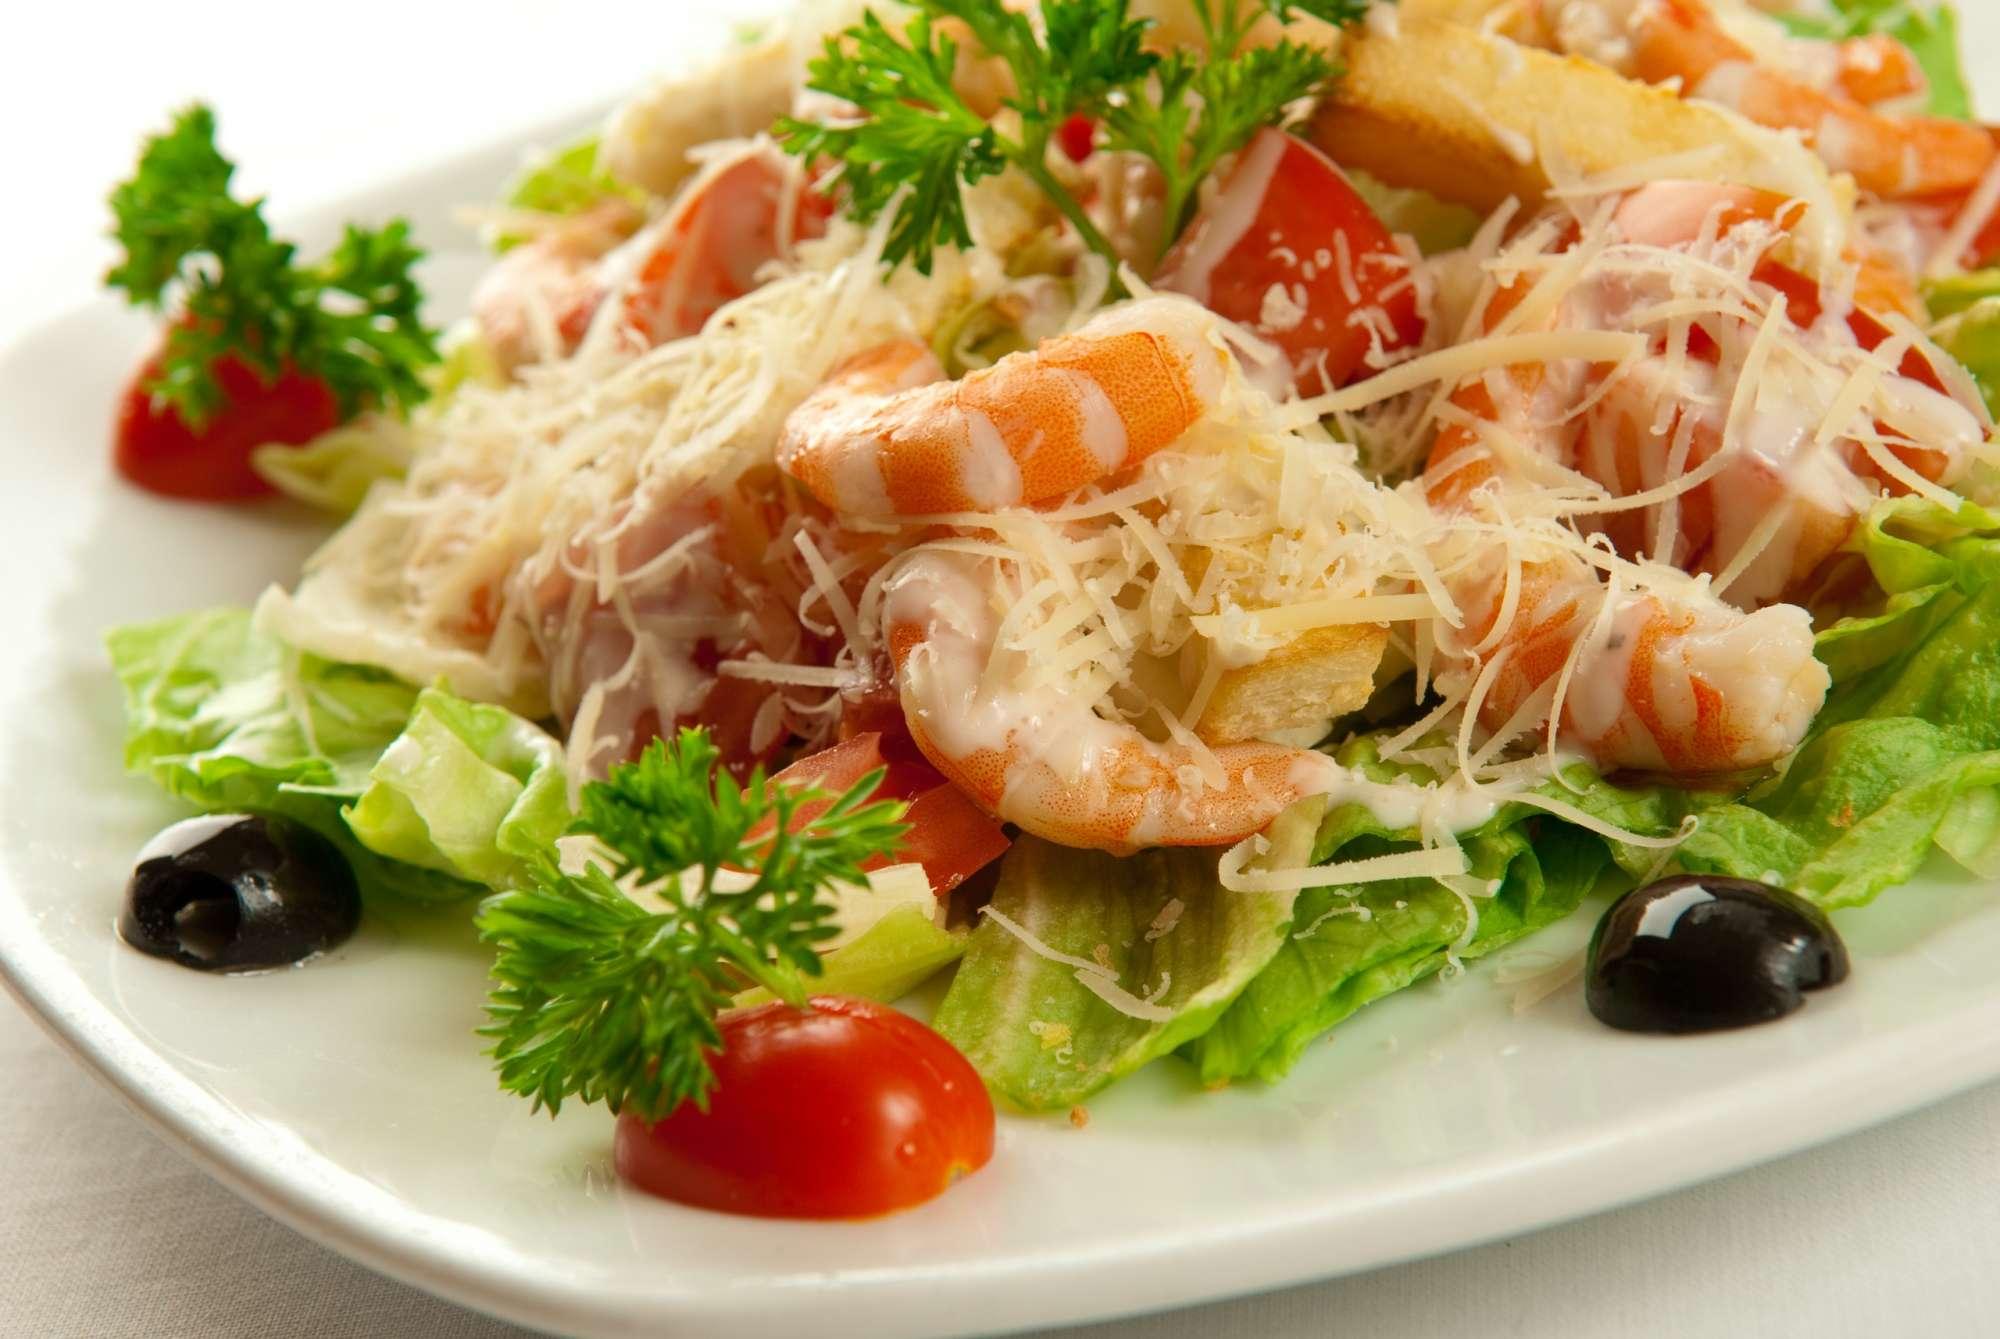 Фото рецепты салата цезаря с креветками